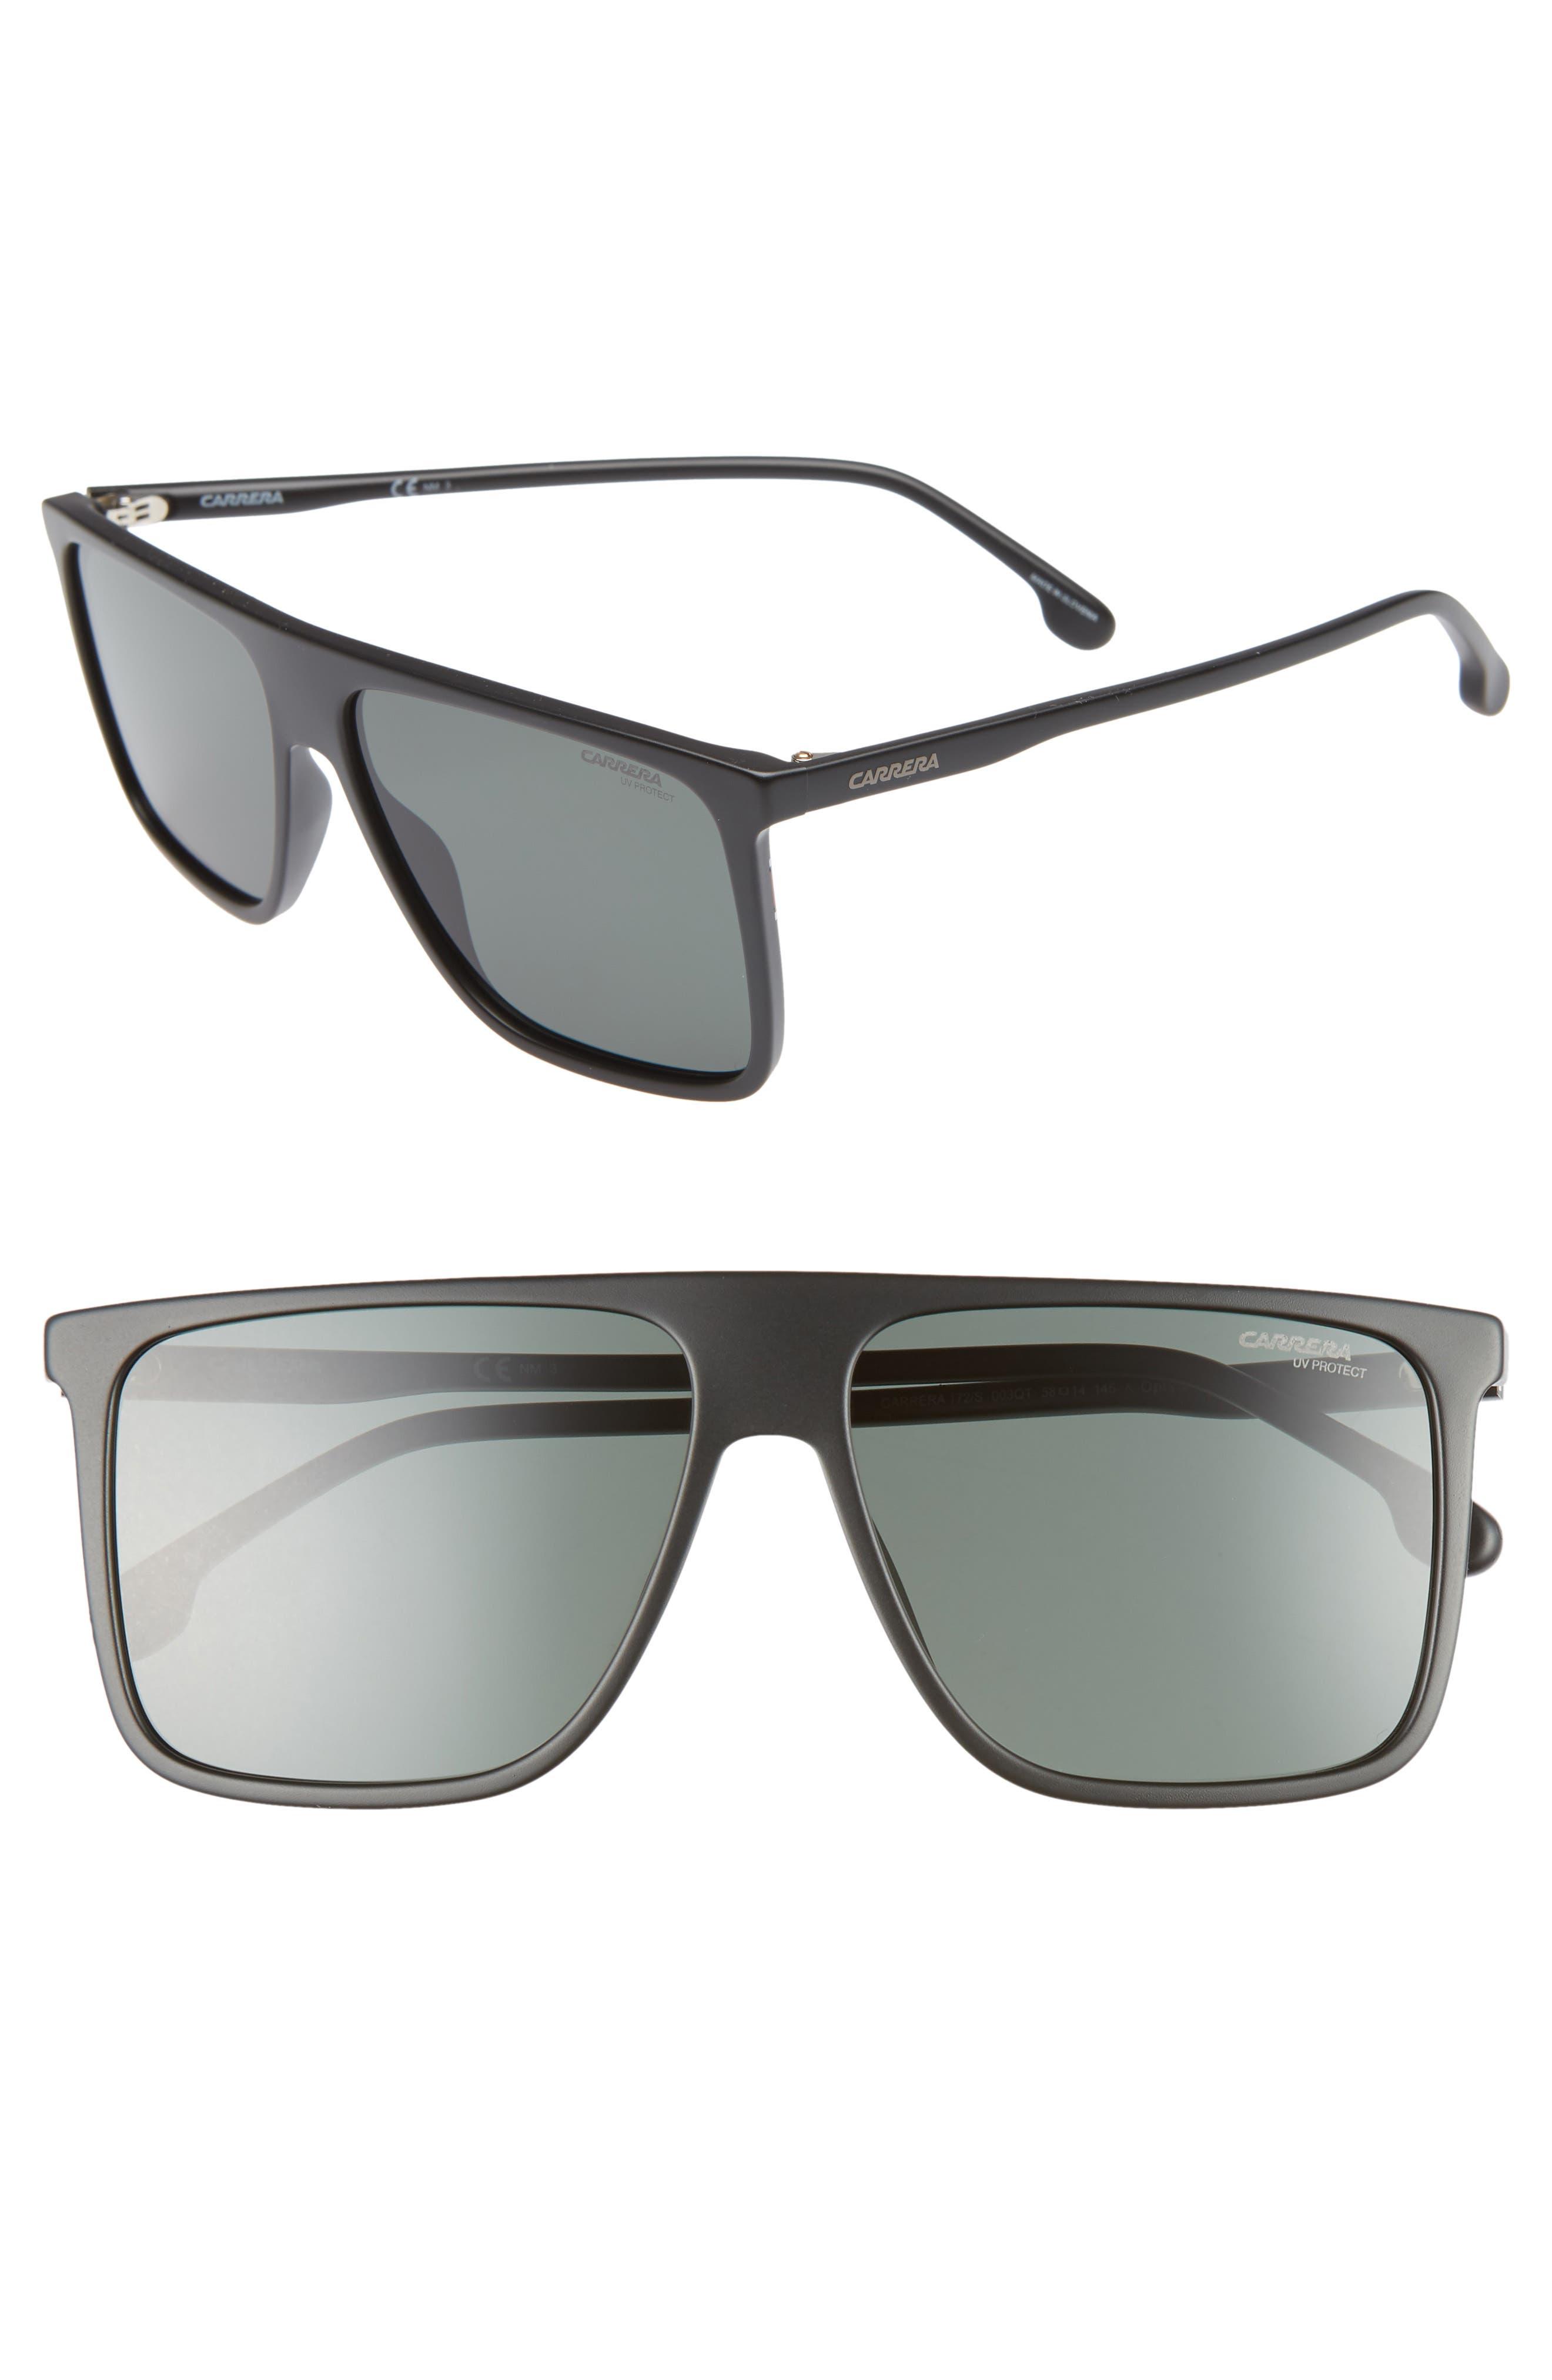 145mm Flat Top Sunglasses,                         Main,                         color, MATTE BLACK